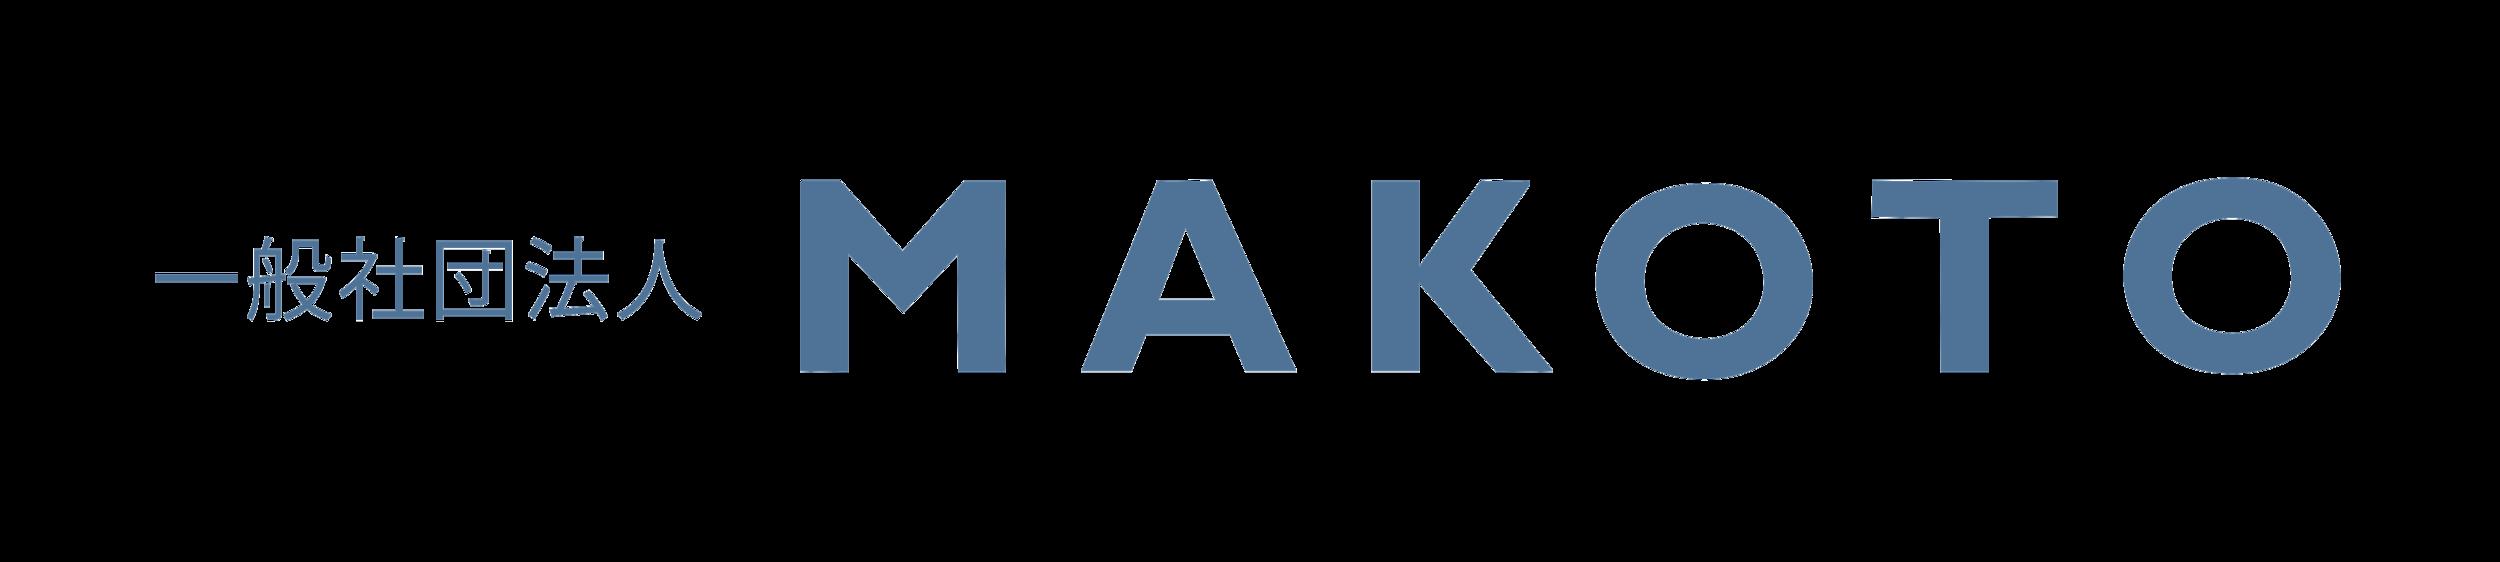 MAKOTO Logo Original (1) vector.png